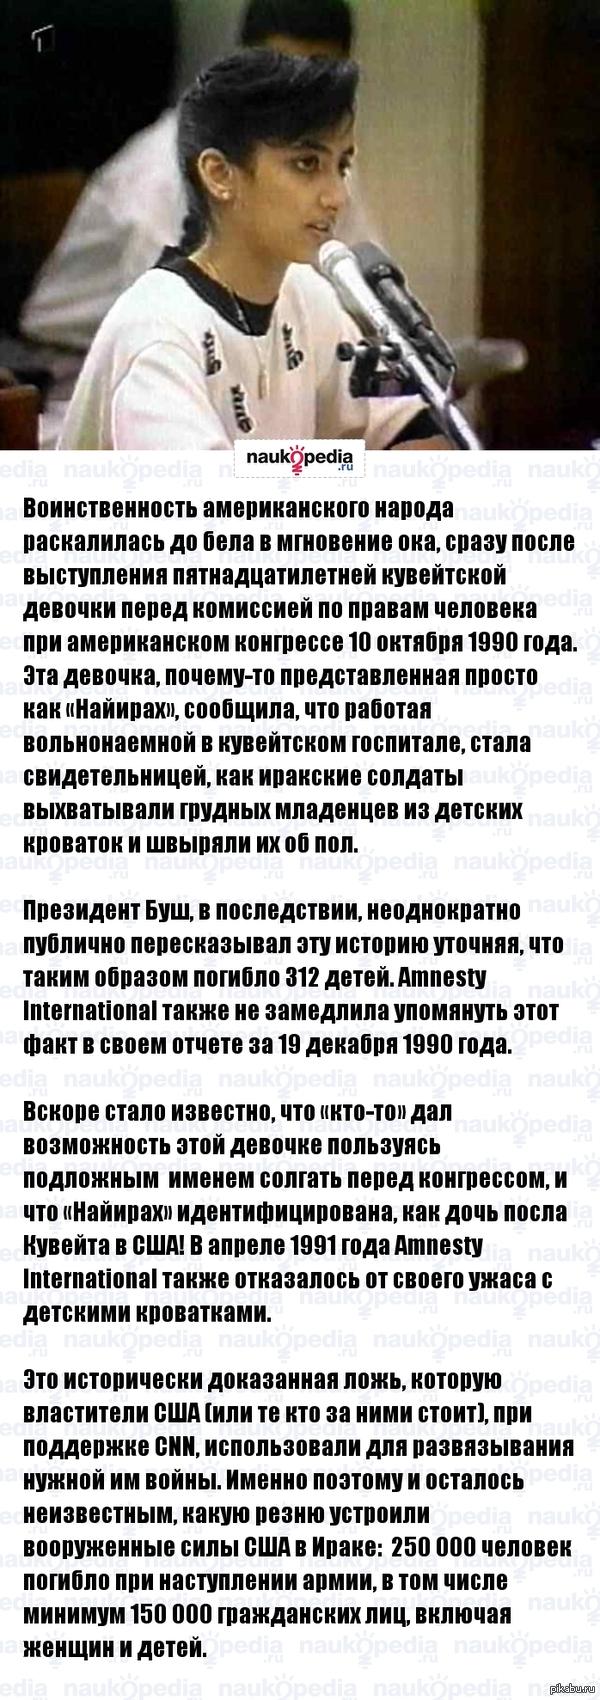 http://s4.pikabu.ru/post_img/2014/12/03/7/1417606278_623086180.jpg